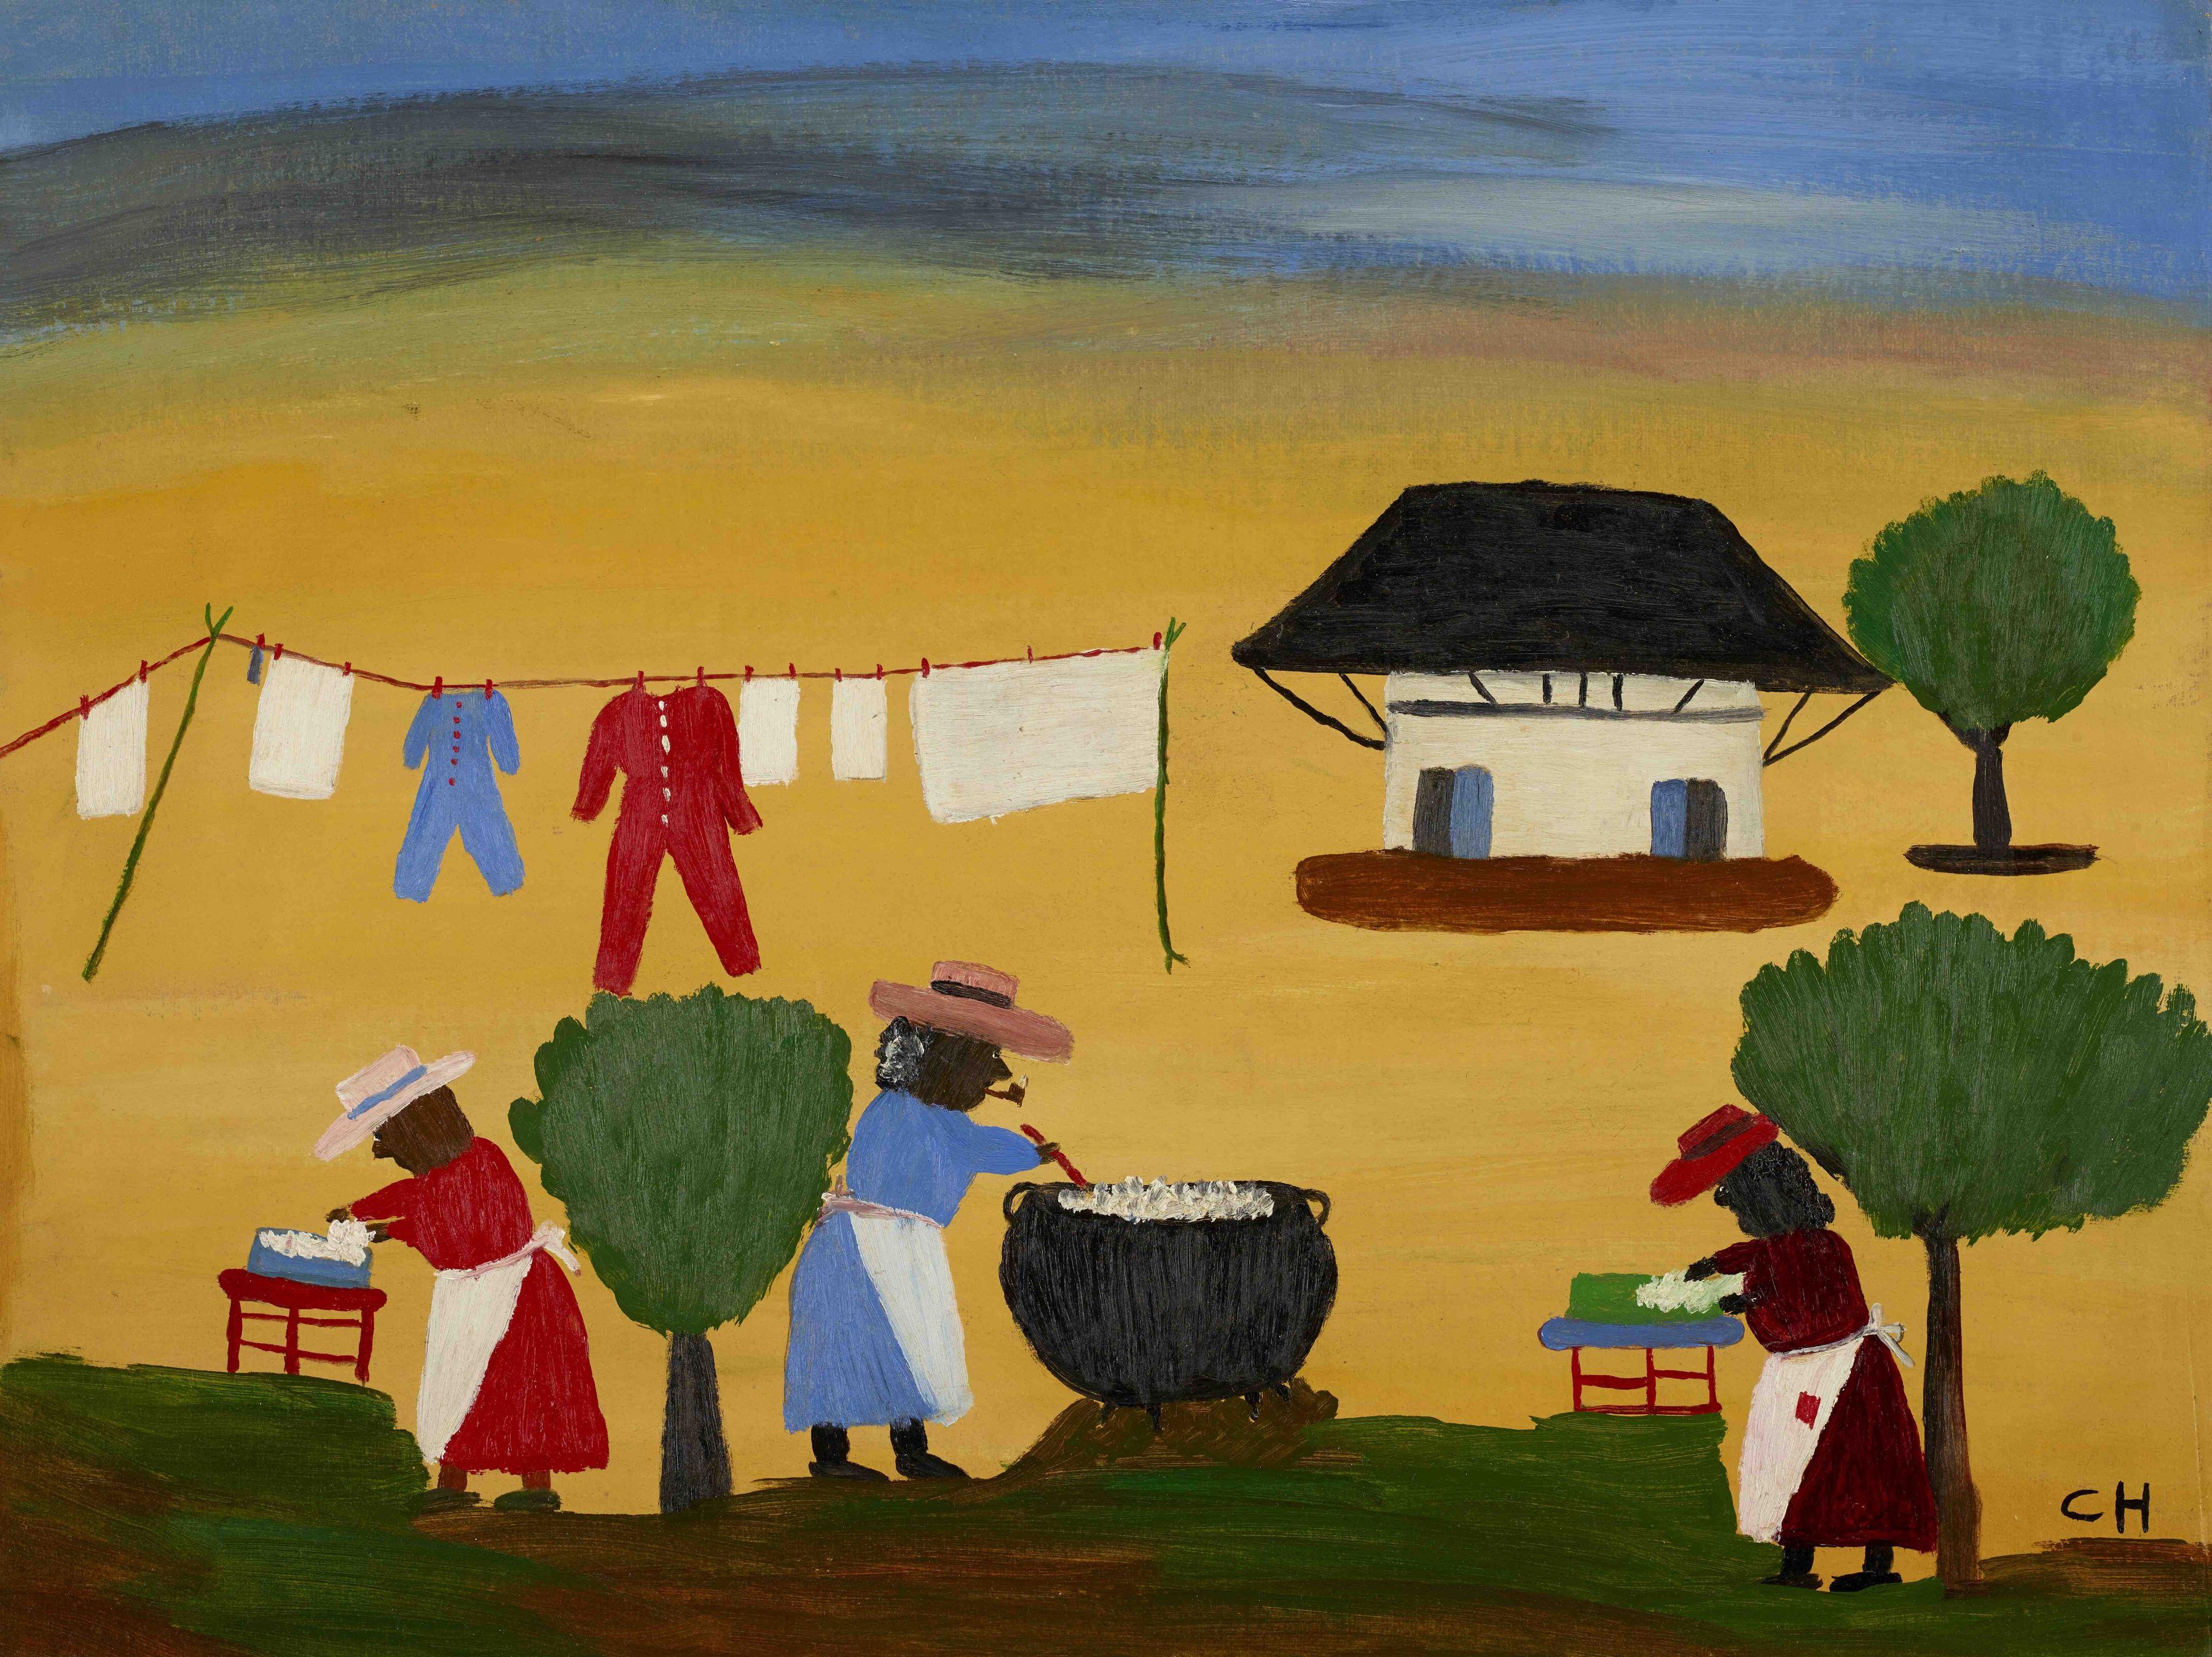 Clementine Hunter The Wash, c. 1950s